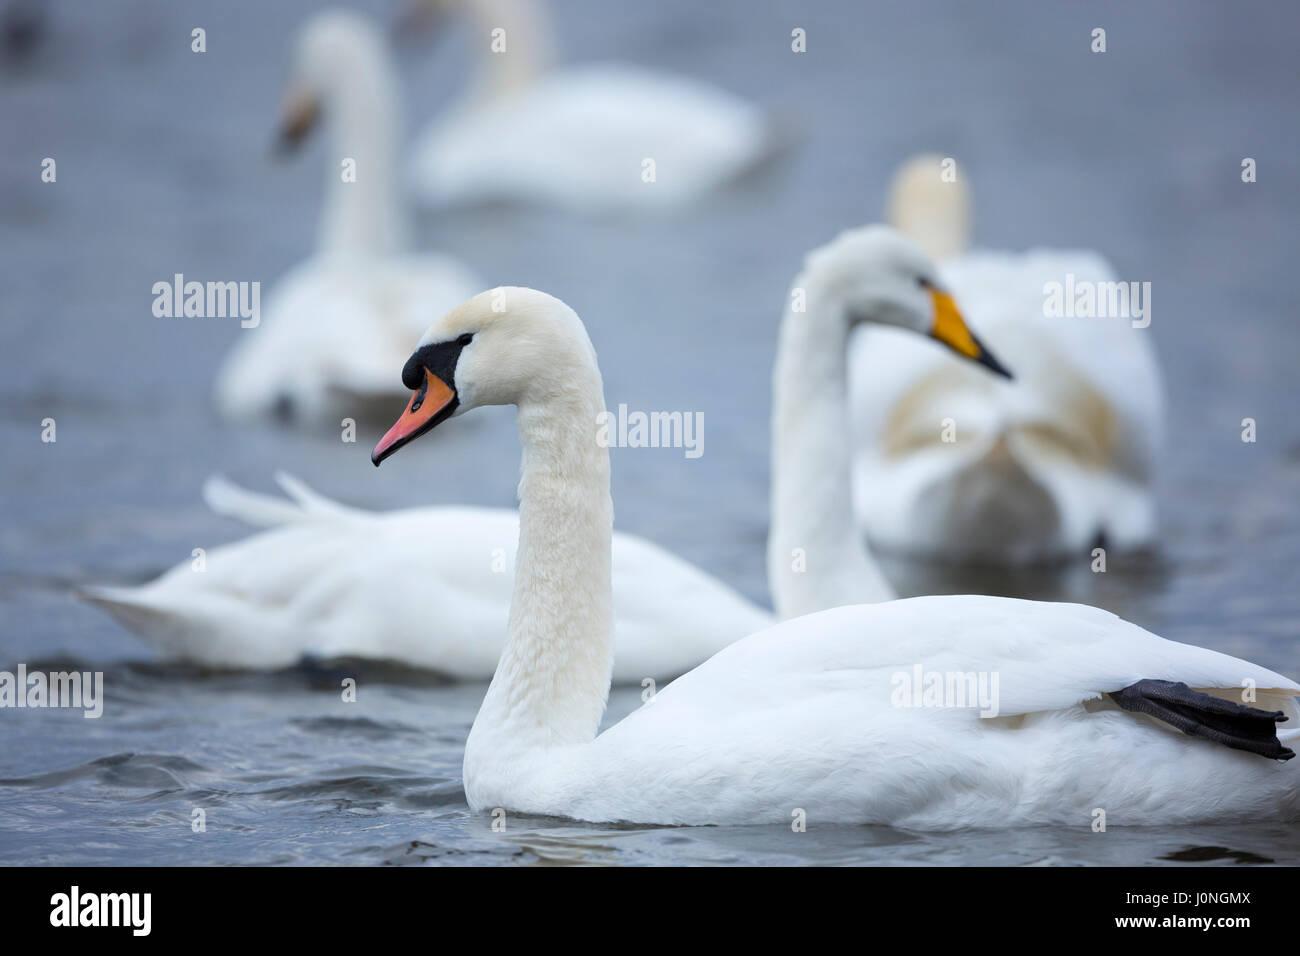 Mute Swan, Cygnus olor, front with Whooper Swan, Cygnus cygnus, behind at Welney Wetland Centre, Norfolk, UK - Stock Image